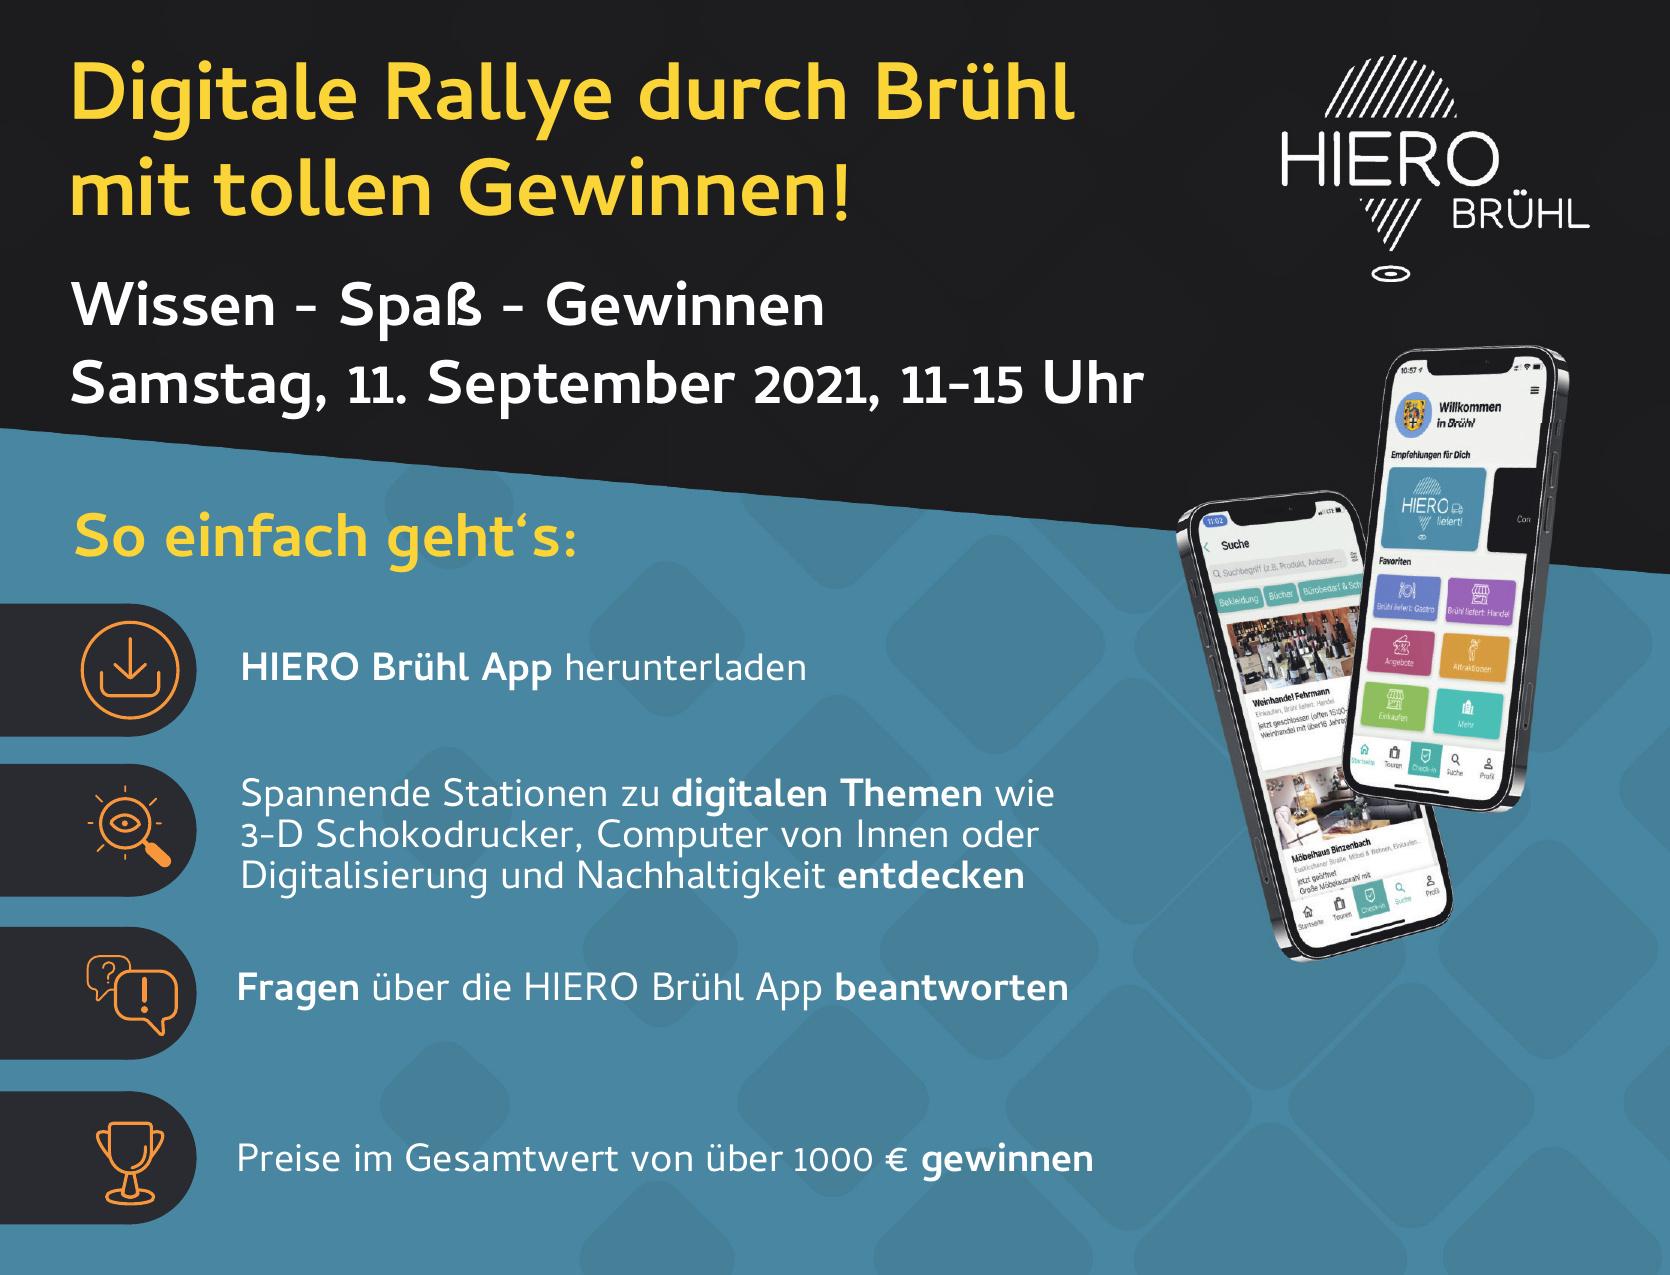 HIERO Brühl